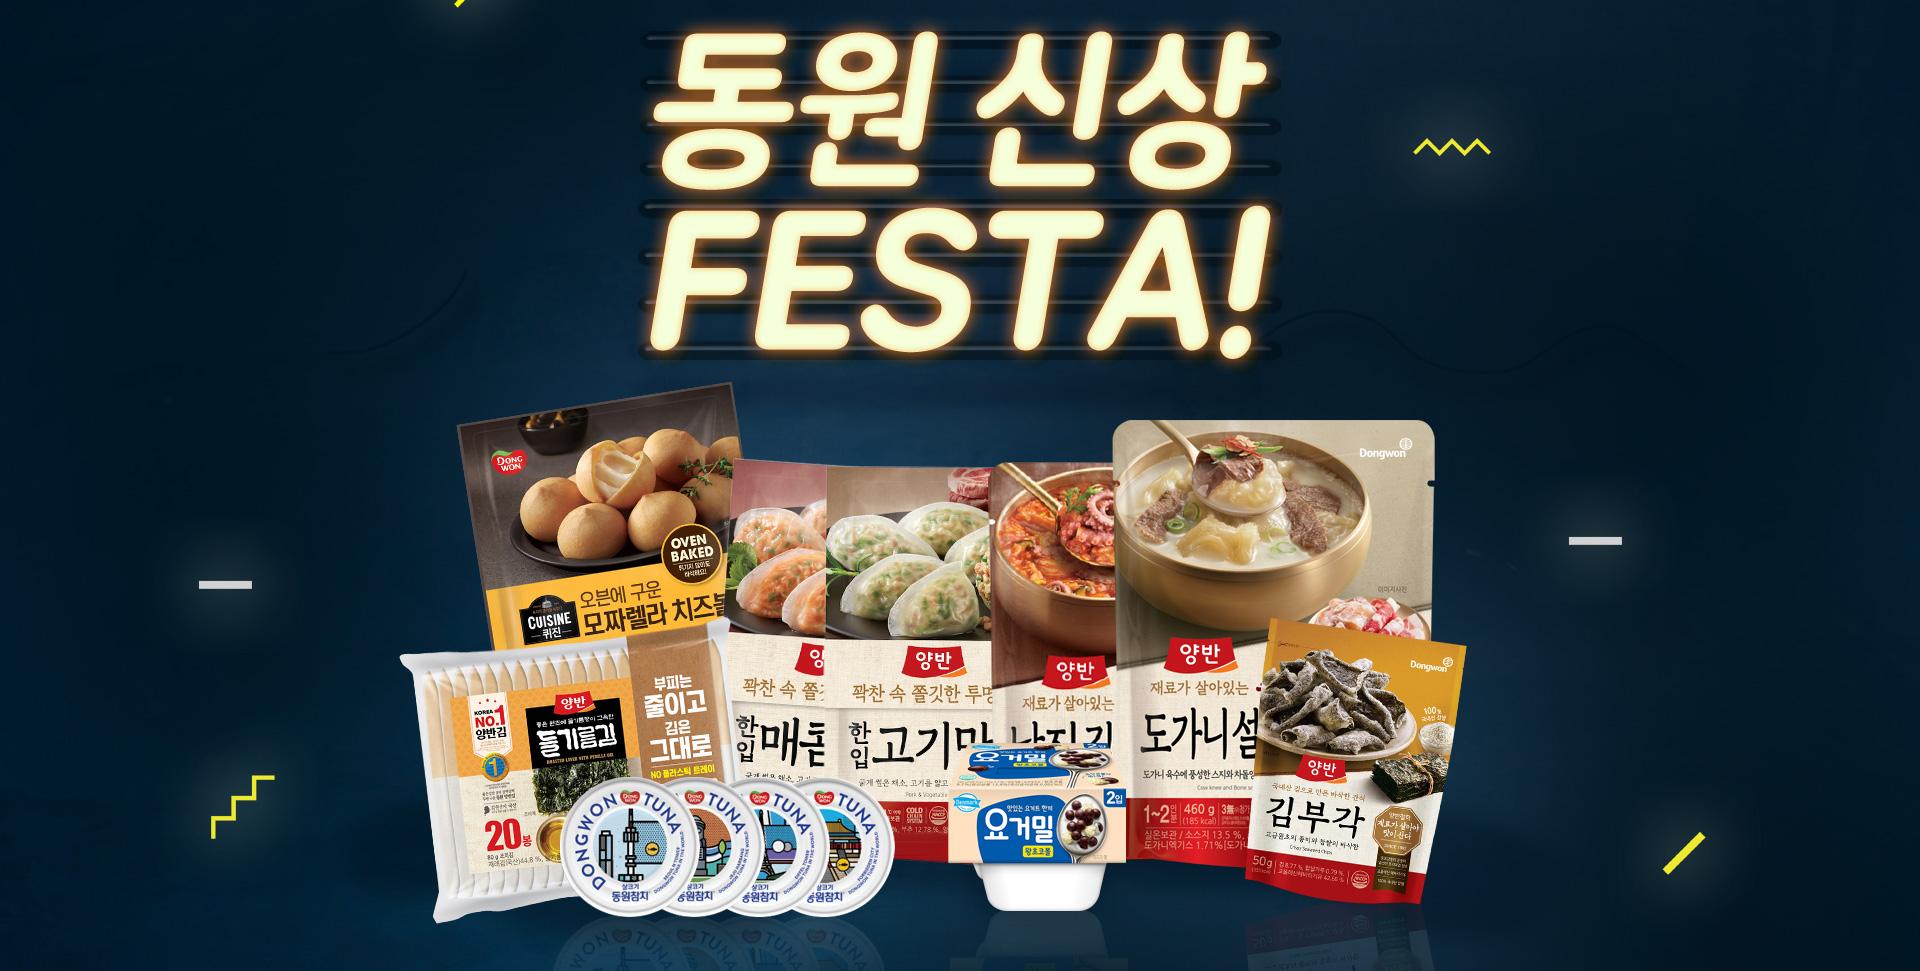 welcome 동원 신상  FESTA